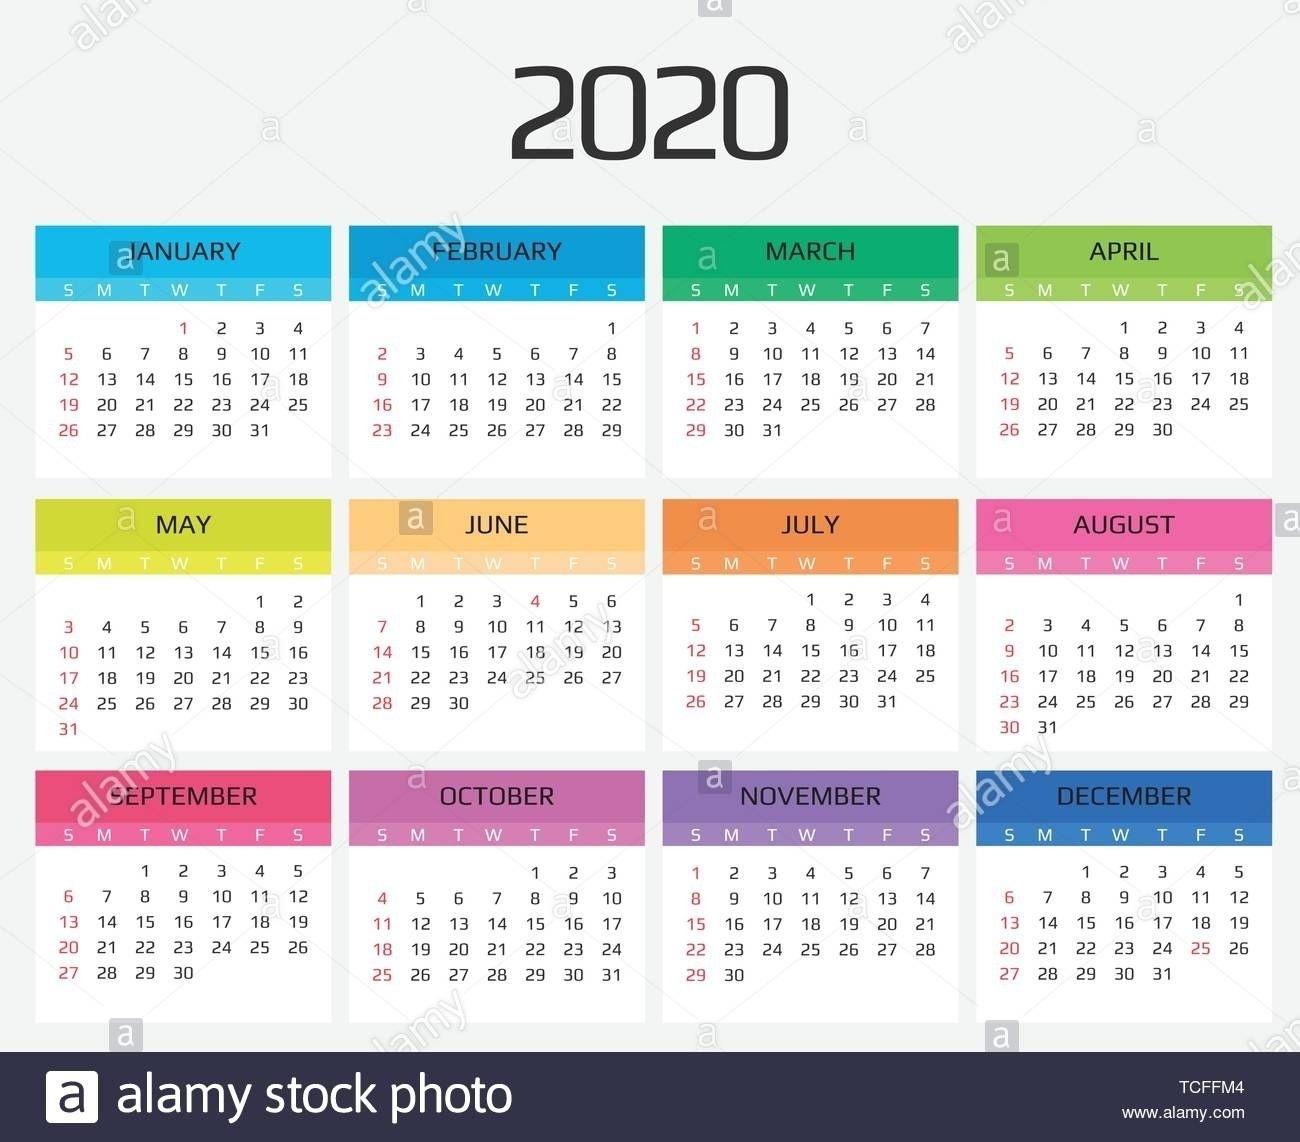 Dashing 2020 Calendar Hong Kong Template In 2020 | Calendar